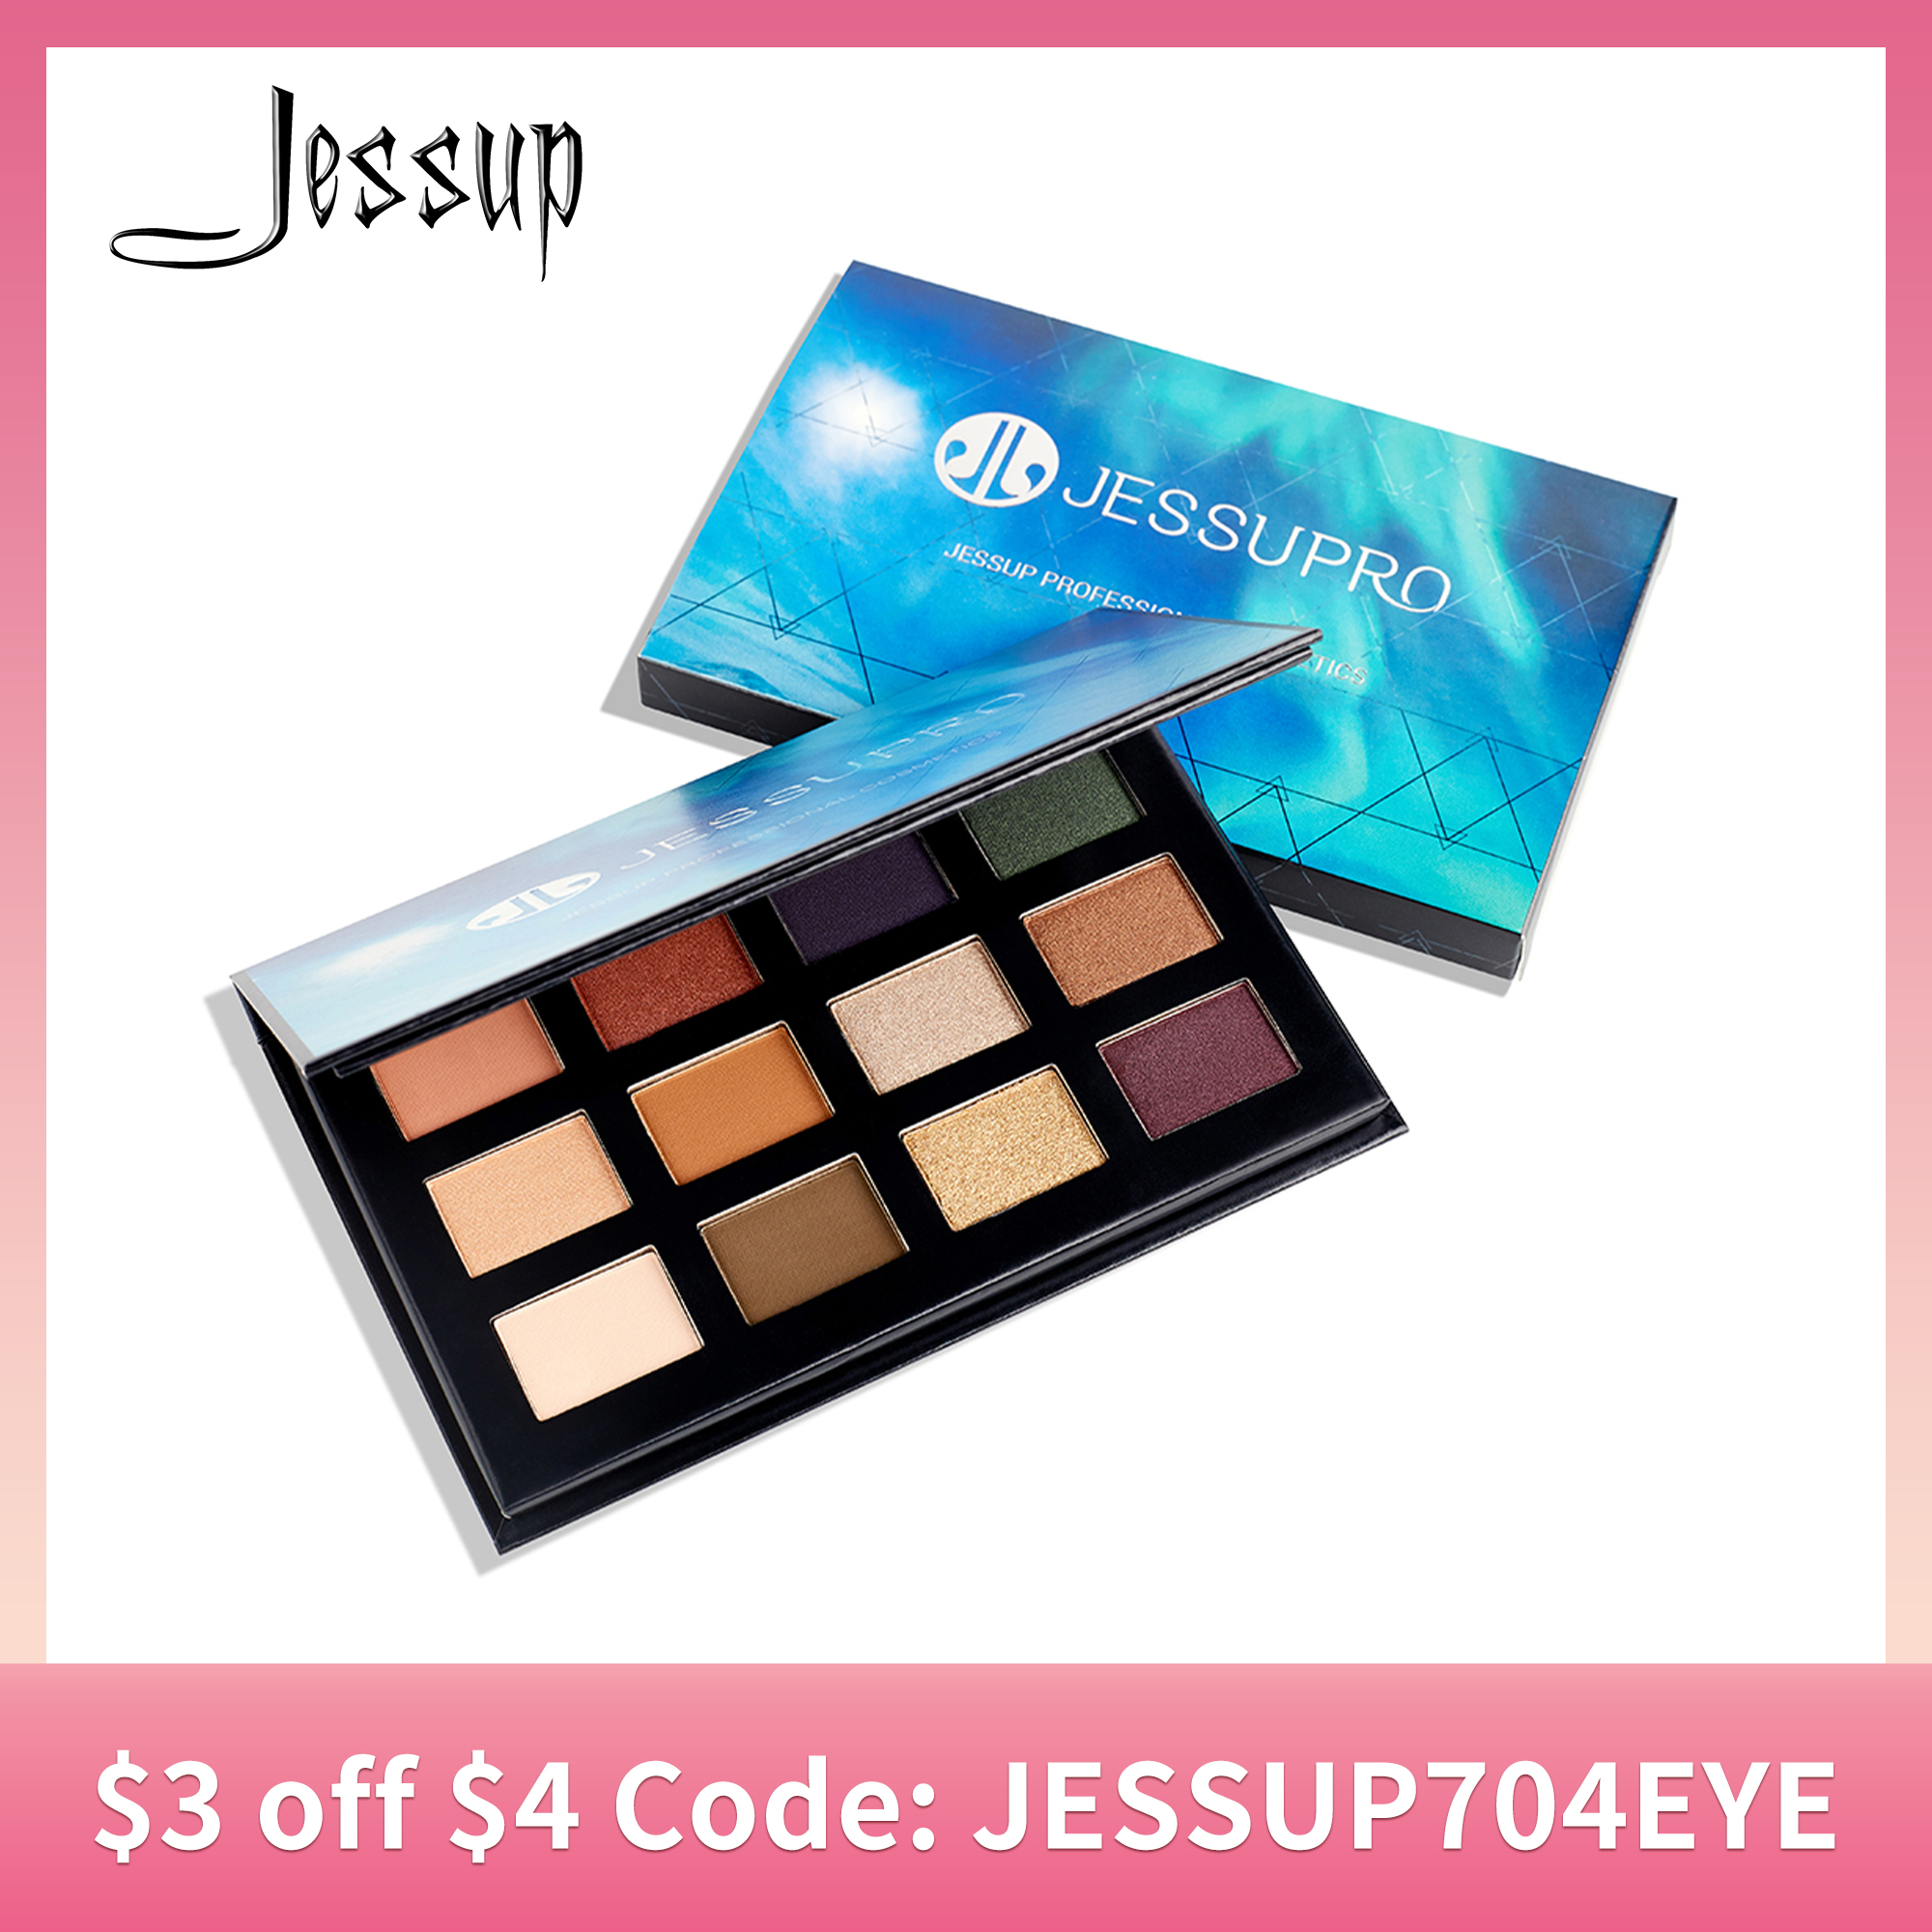 Jessup 12 colors Makeup Eyeshadow Palette Brighten Glitter Natural Shimmer Pigment Eye Shadow Palettes branded|Eye Shadow| - AliExpress